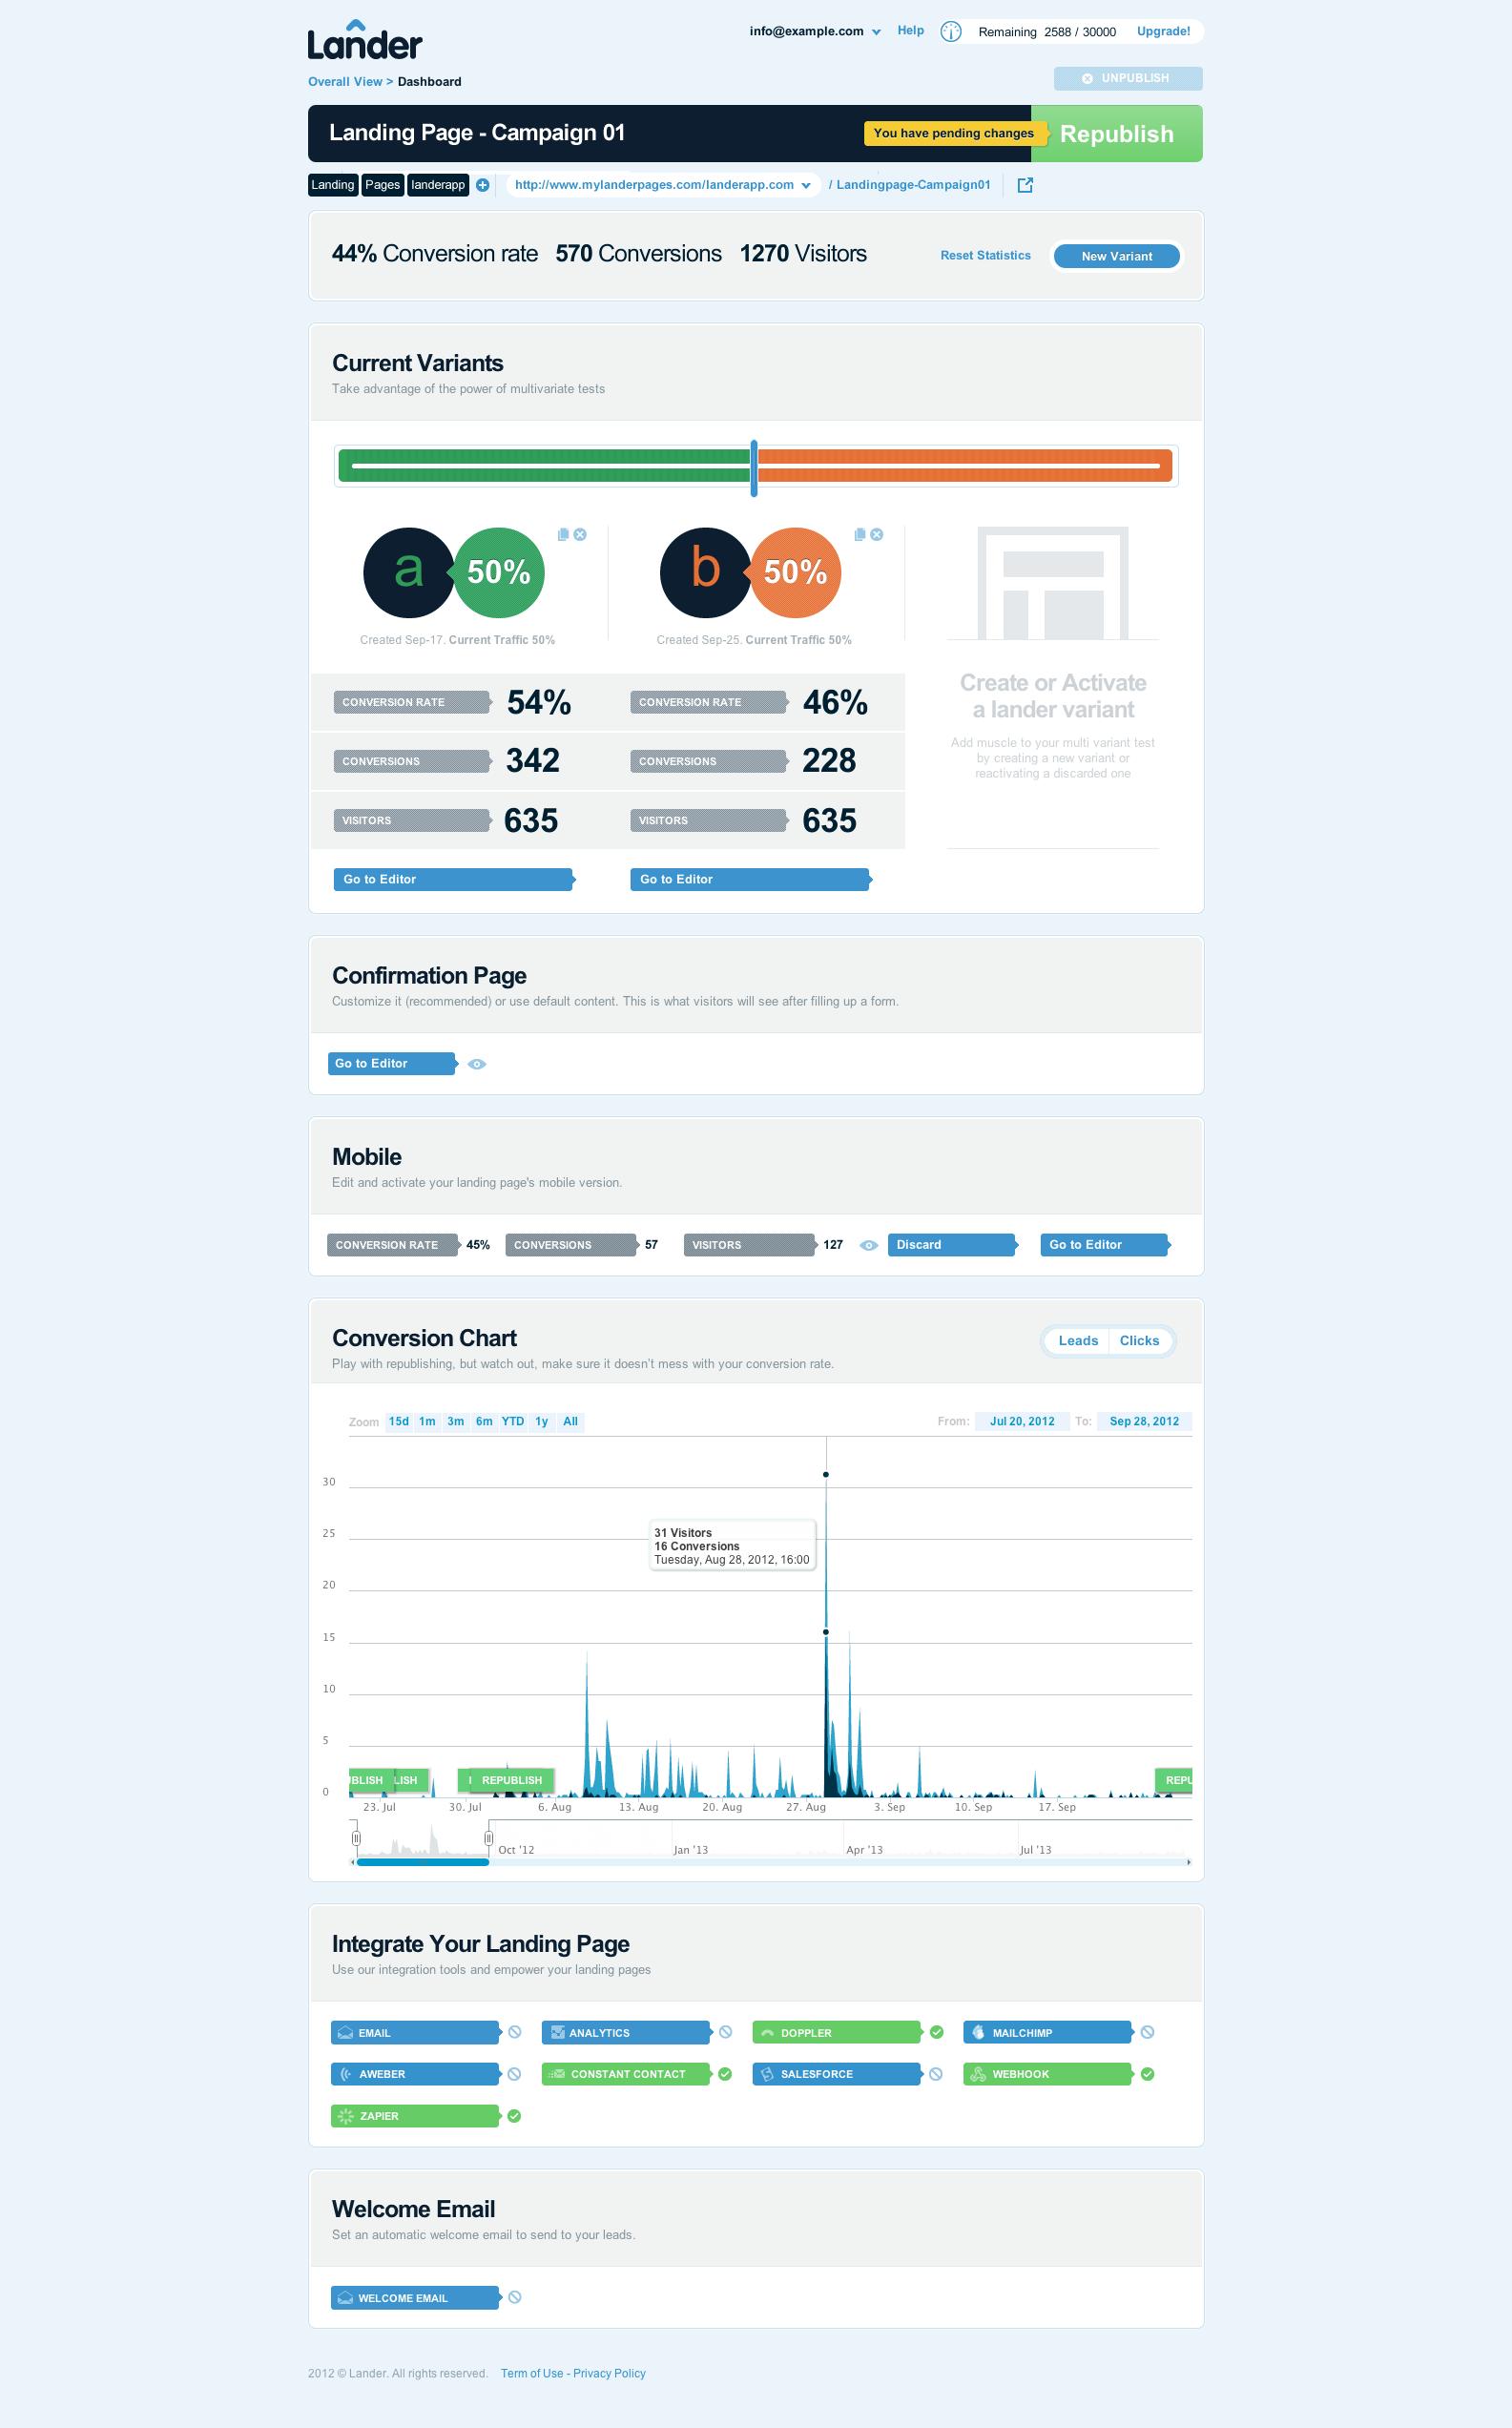 Lander Demo - Lander Editor Dashboard